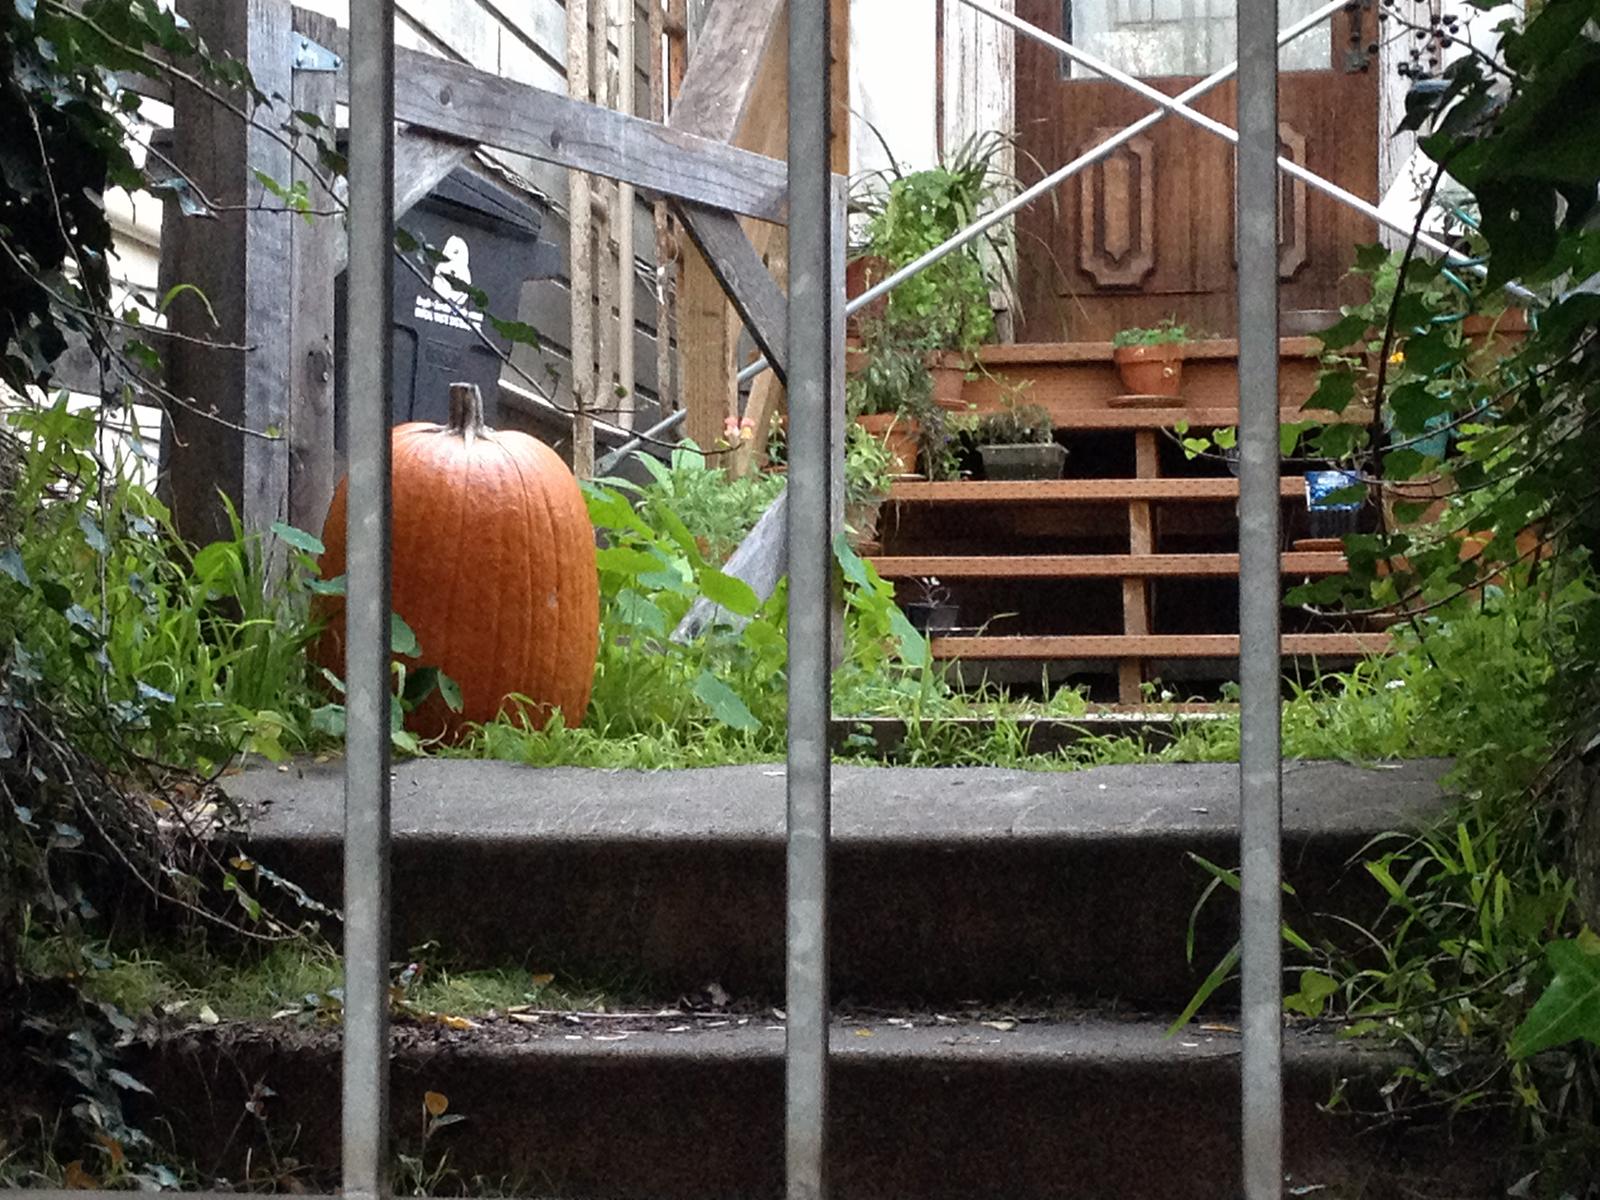 A garden on Folsom Street.